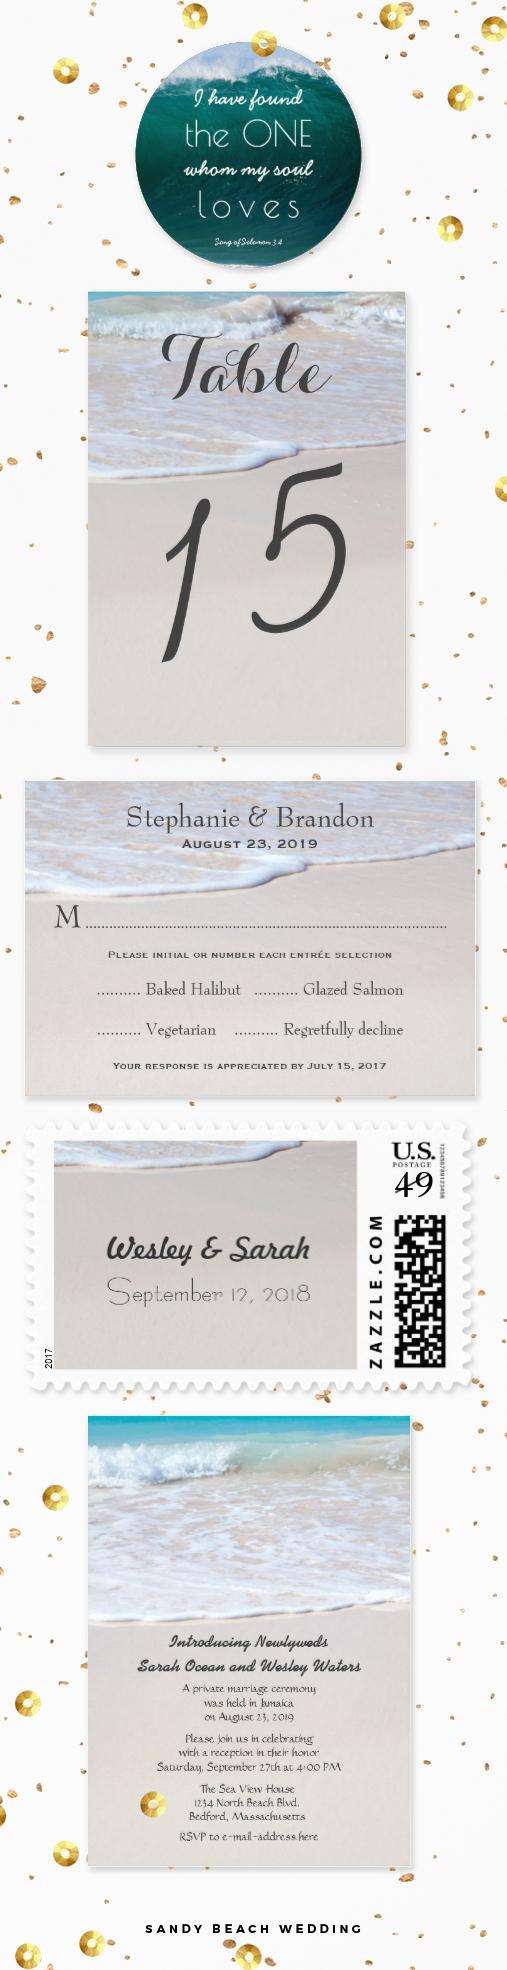 Beach sand wedding invitations, custom postage stamps, menu reply ...